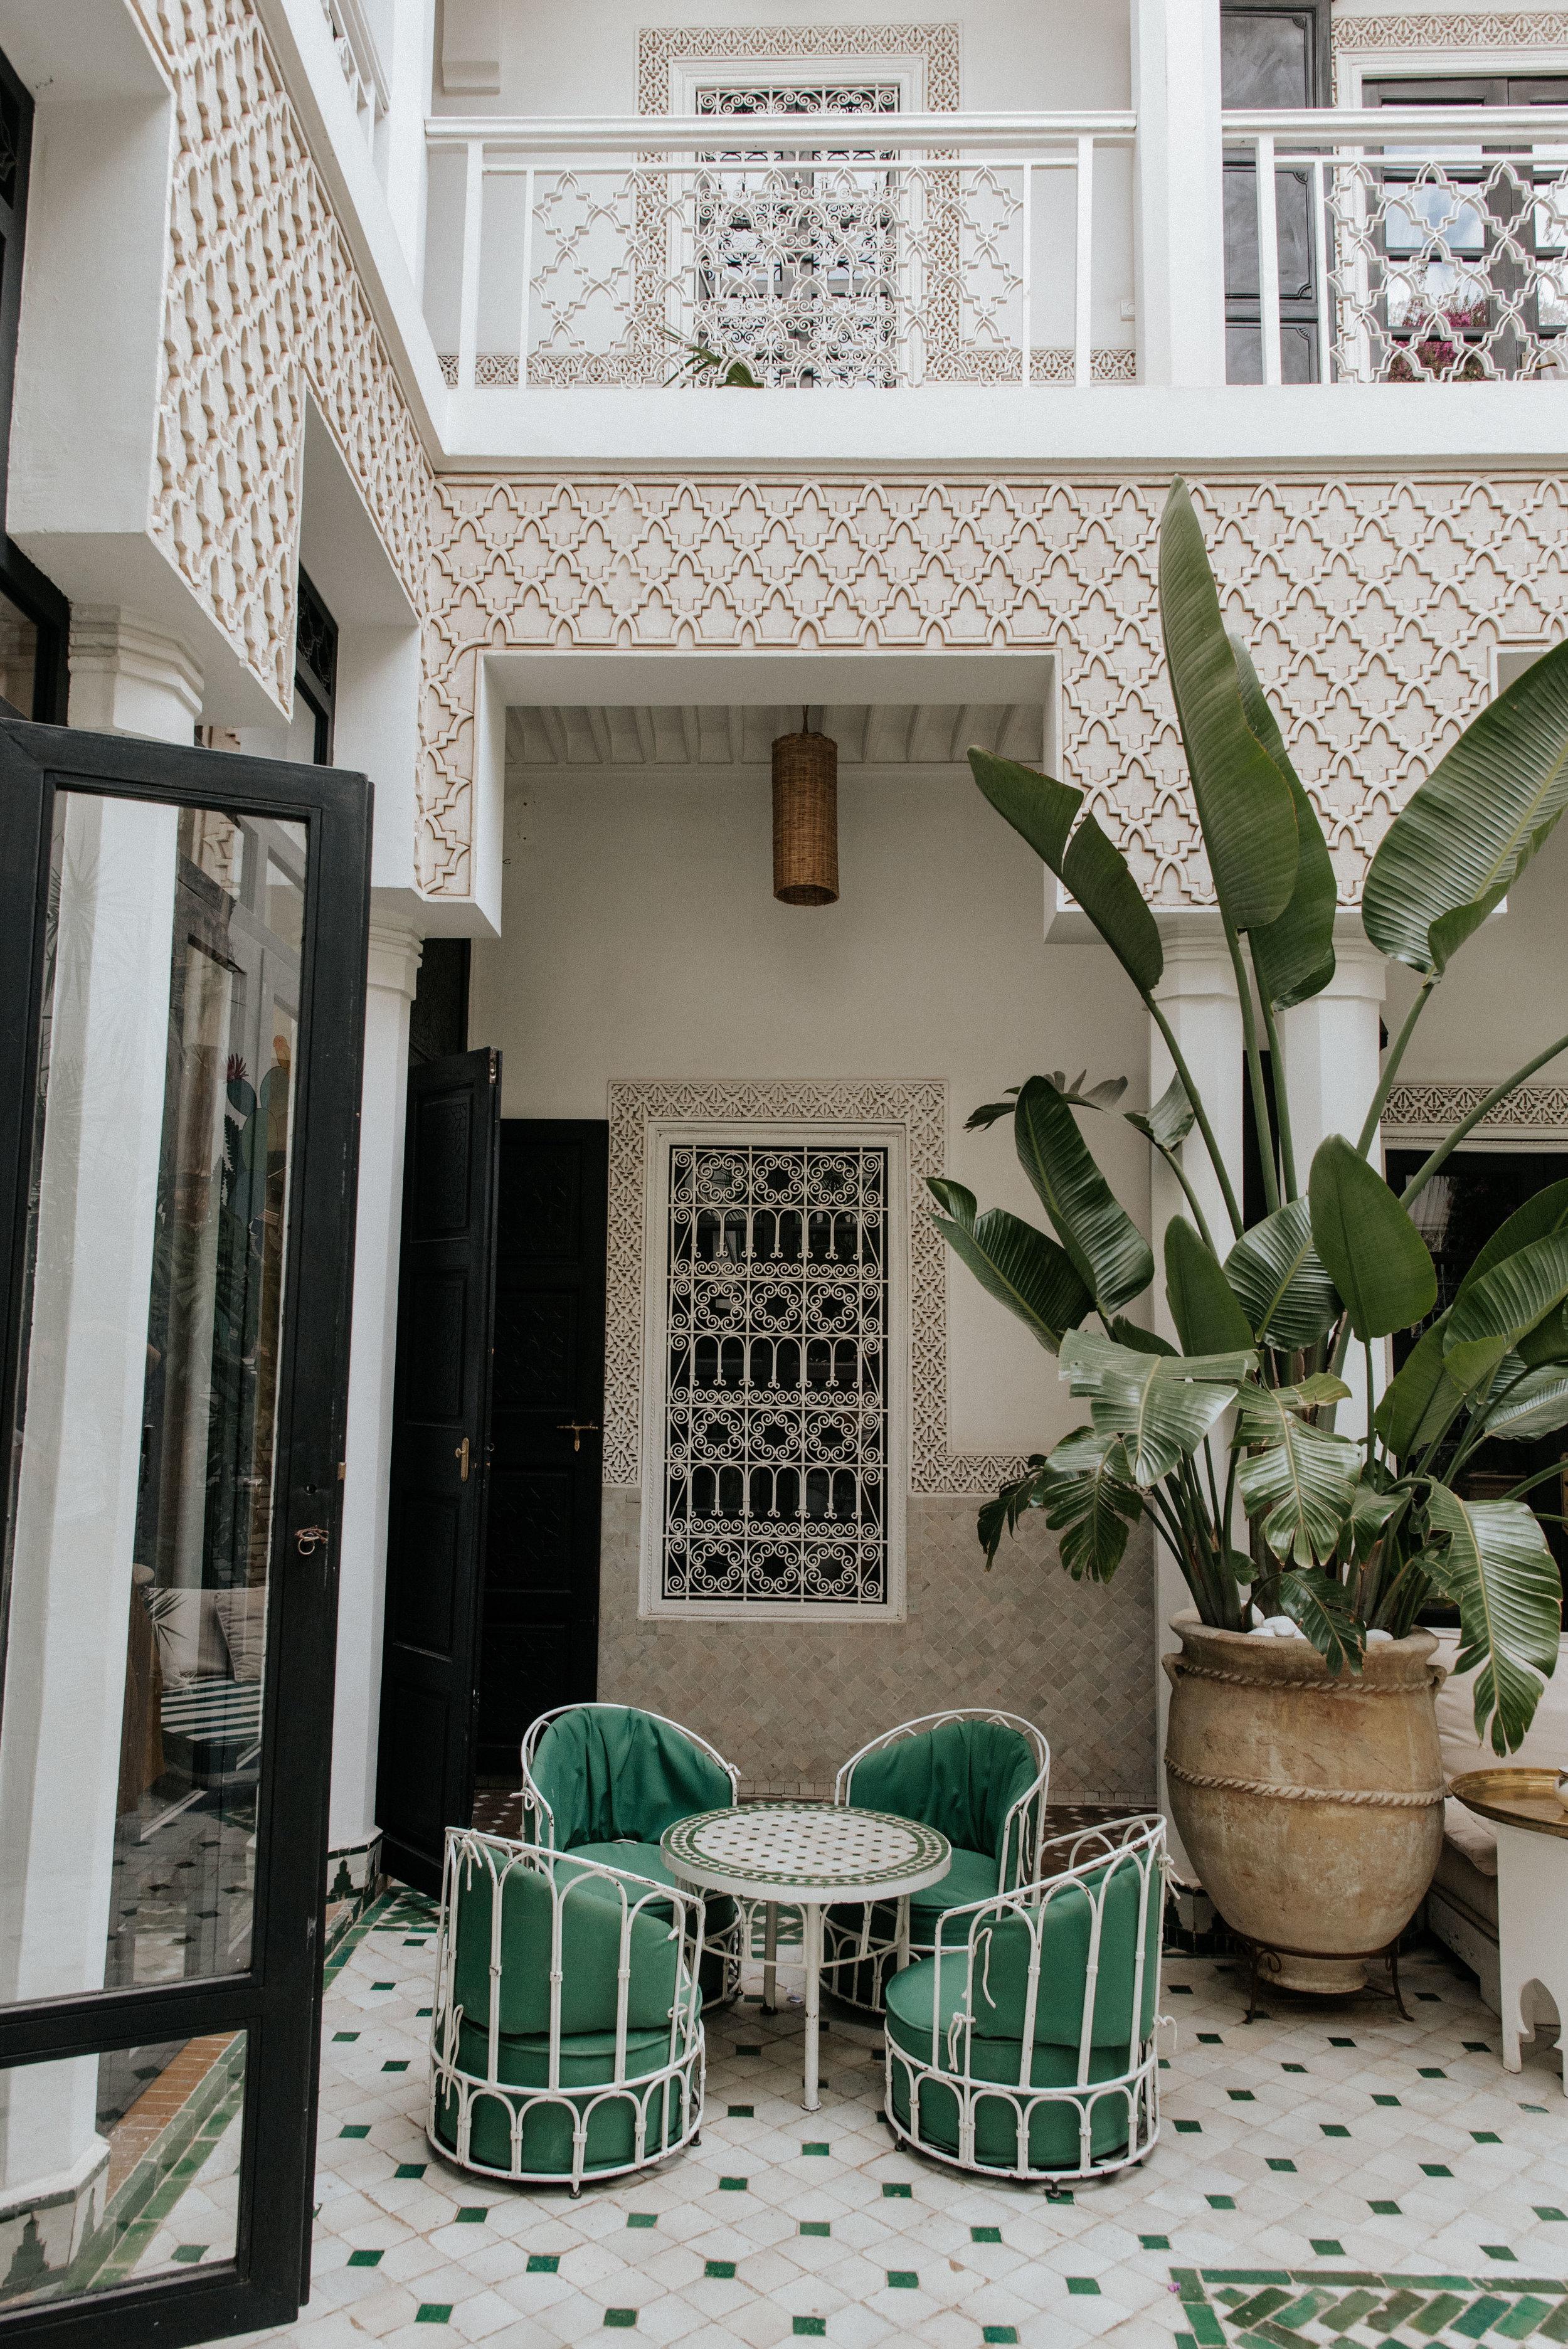 Morocco-444.jpg